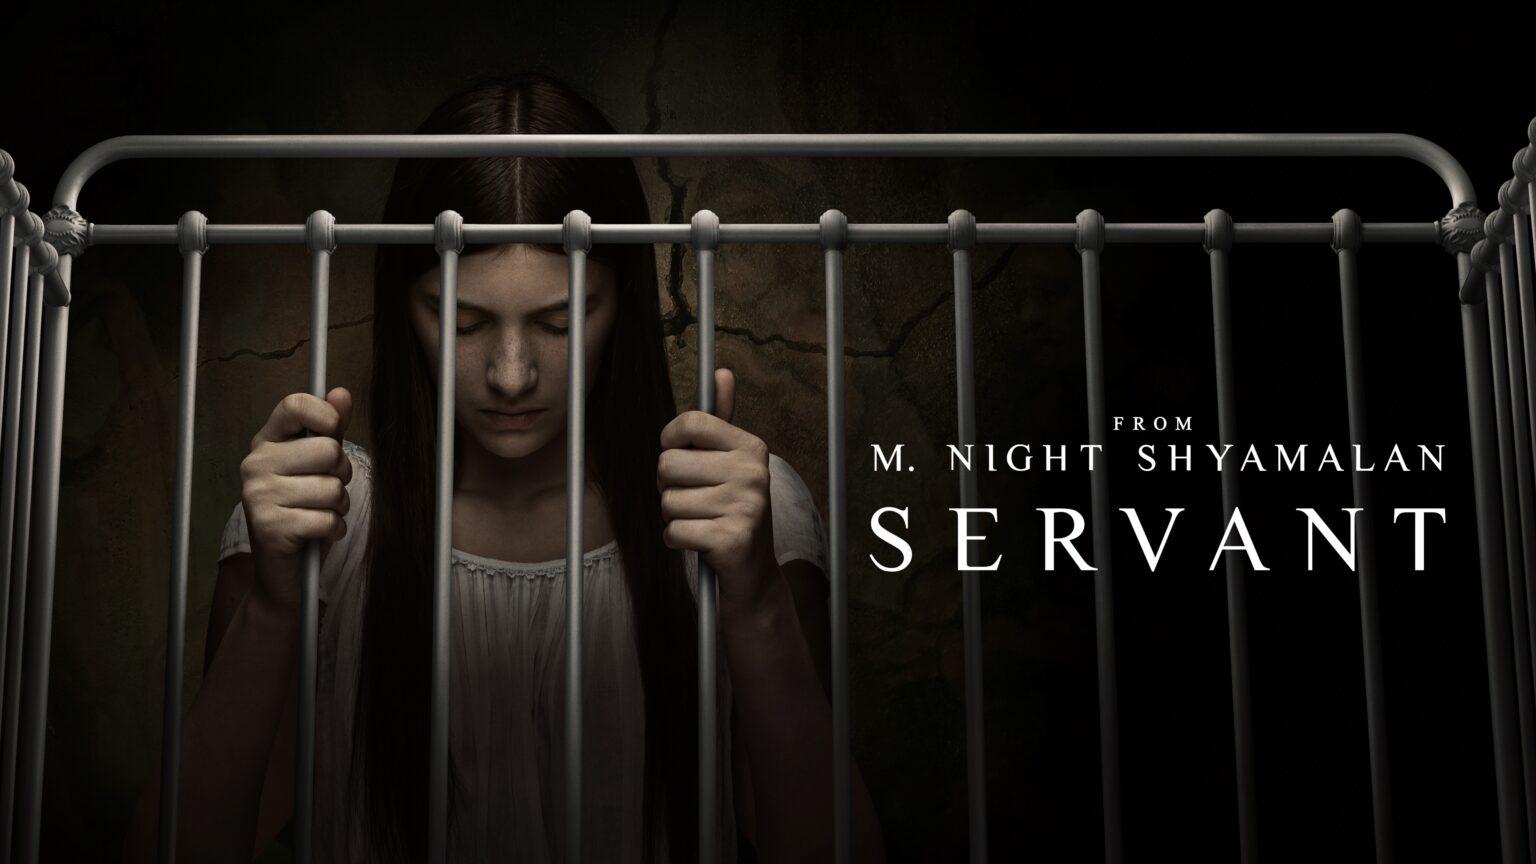 'Servant' Season 2 debuted in January 2021 on Apple TV+.